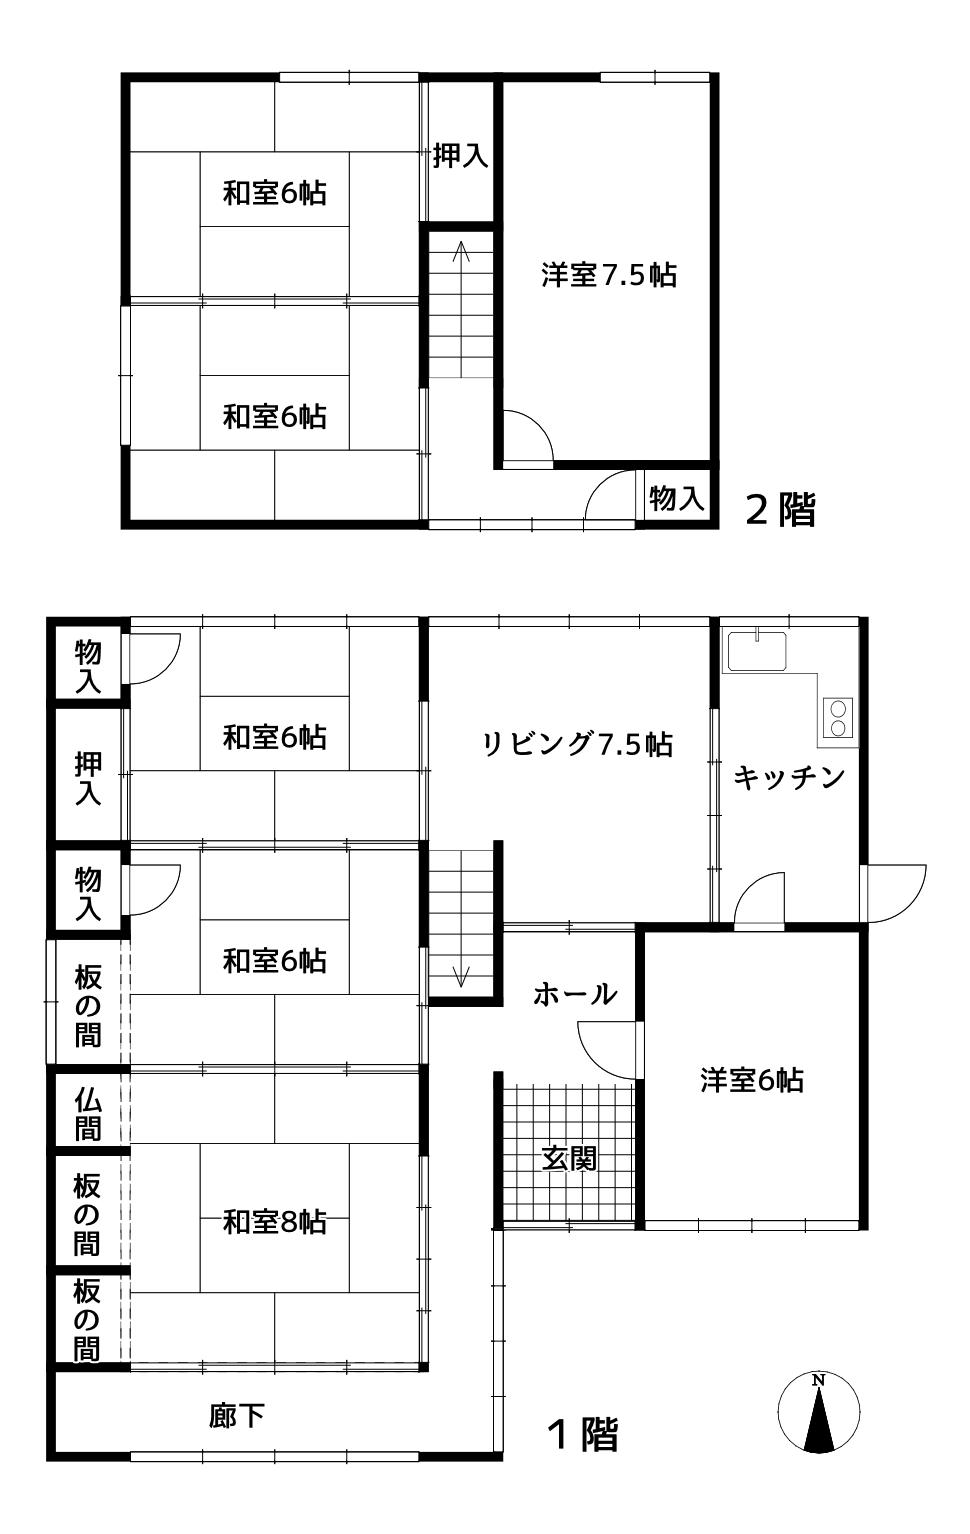 78282ea6a0f8911fed582087656fc318 - 【木津川市加茂町】中古戸建。敷地面積600坪以上。